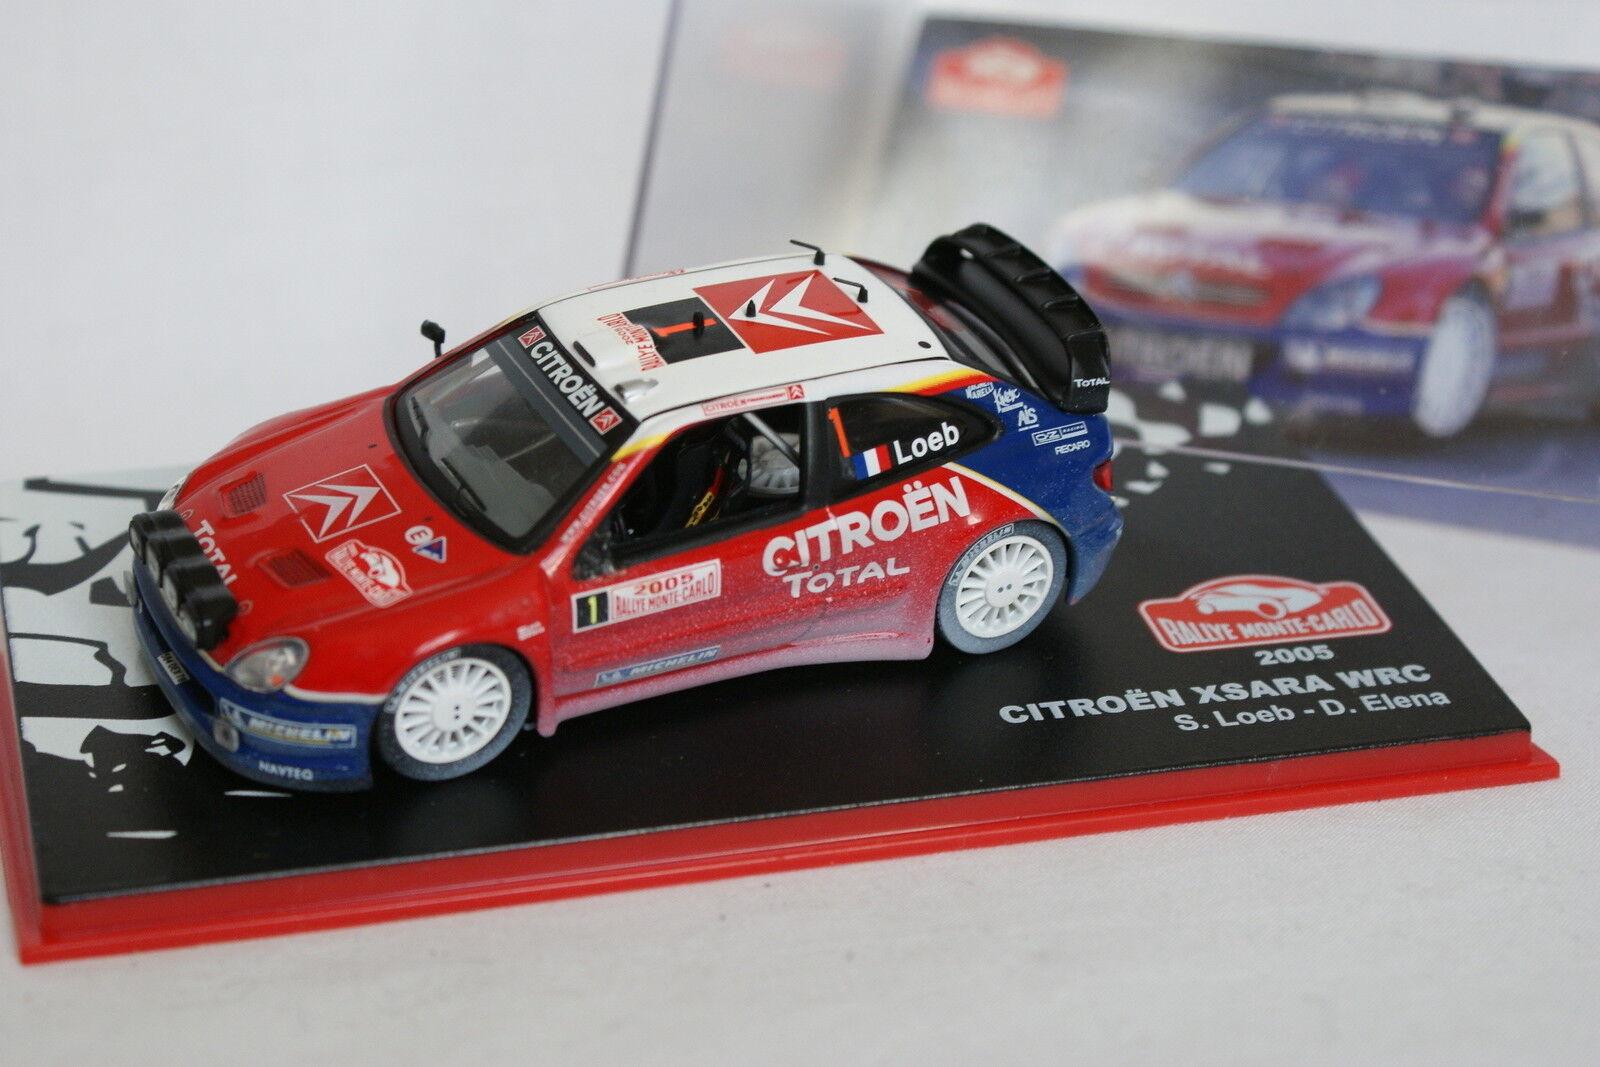 Ixo Press Rally Mounted Carlo 1 43 43 43 - Citroen Xsara WRC 2005 5d7dc1